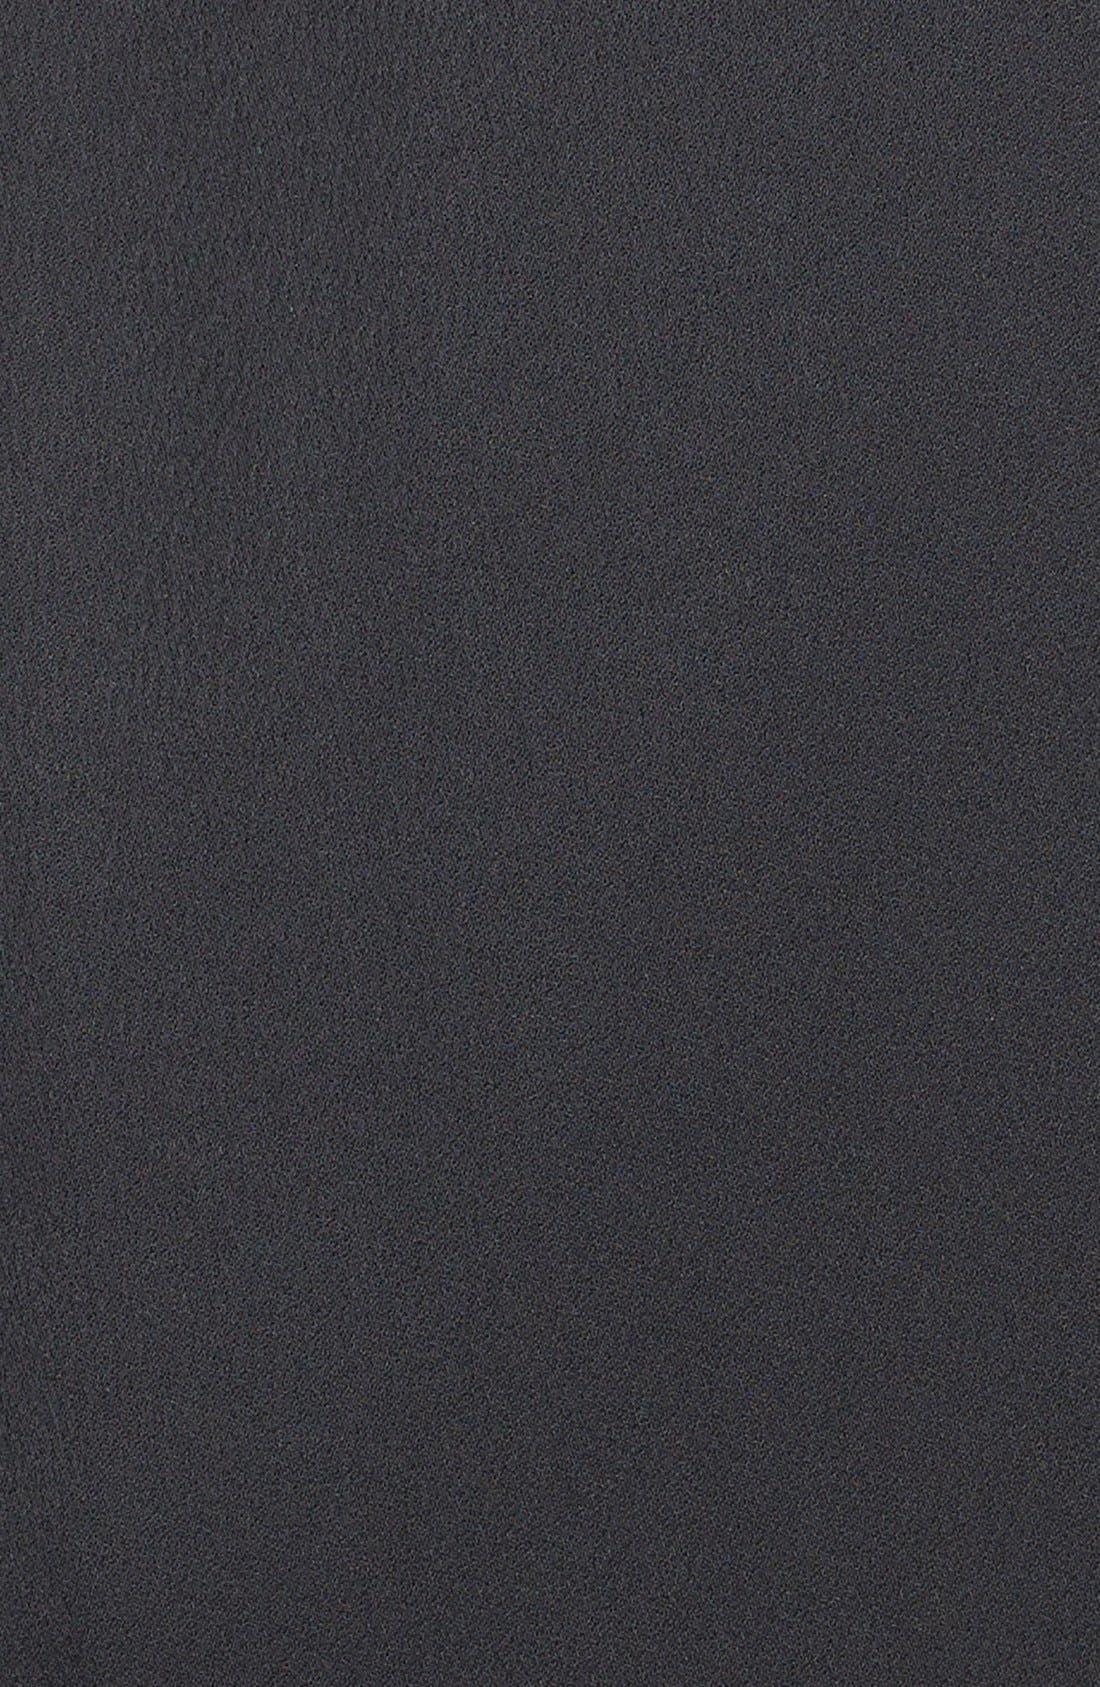 Alternate Image 3  - Ted Baker London 'Poielle' Woven Sheath Dress